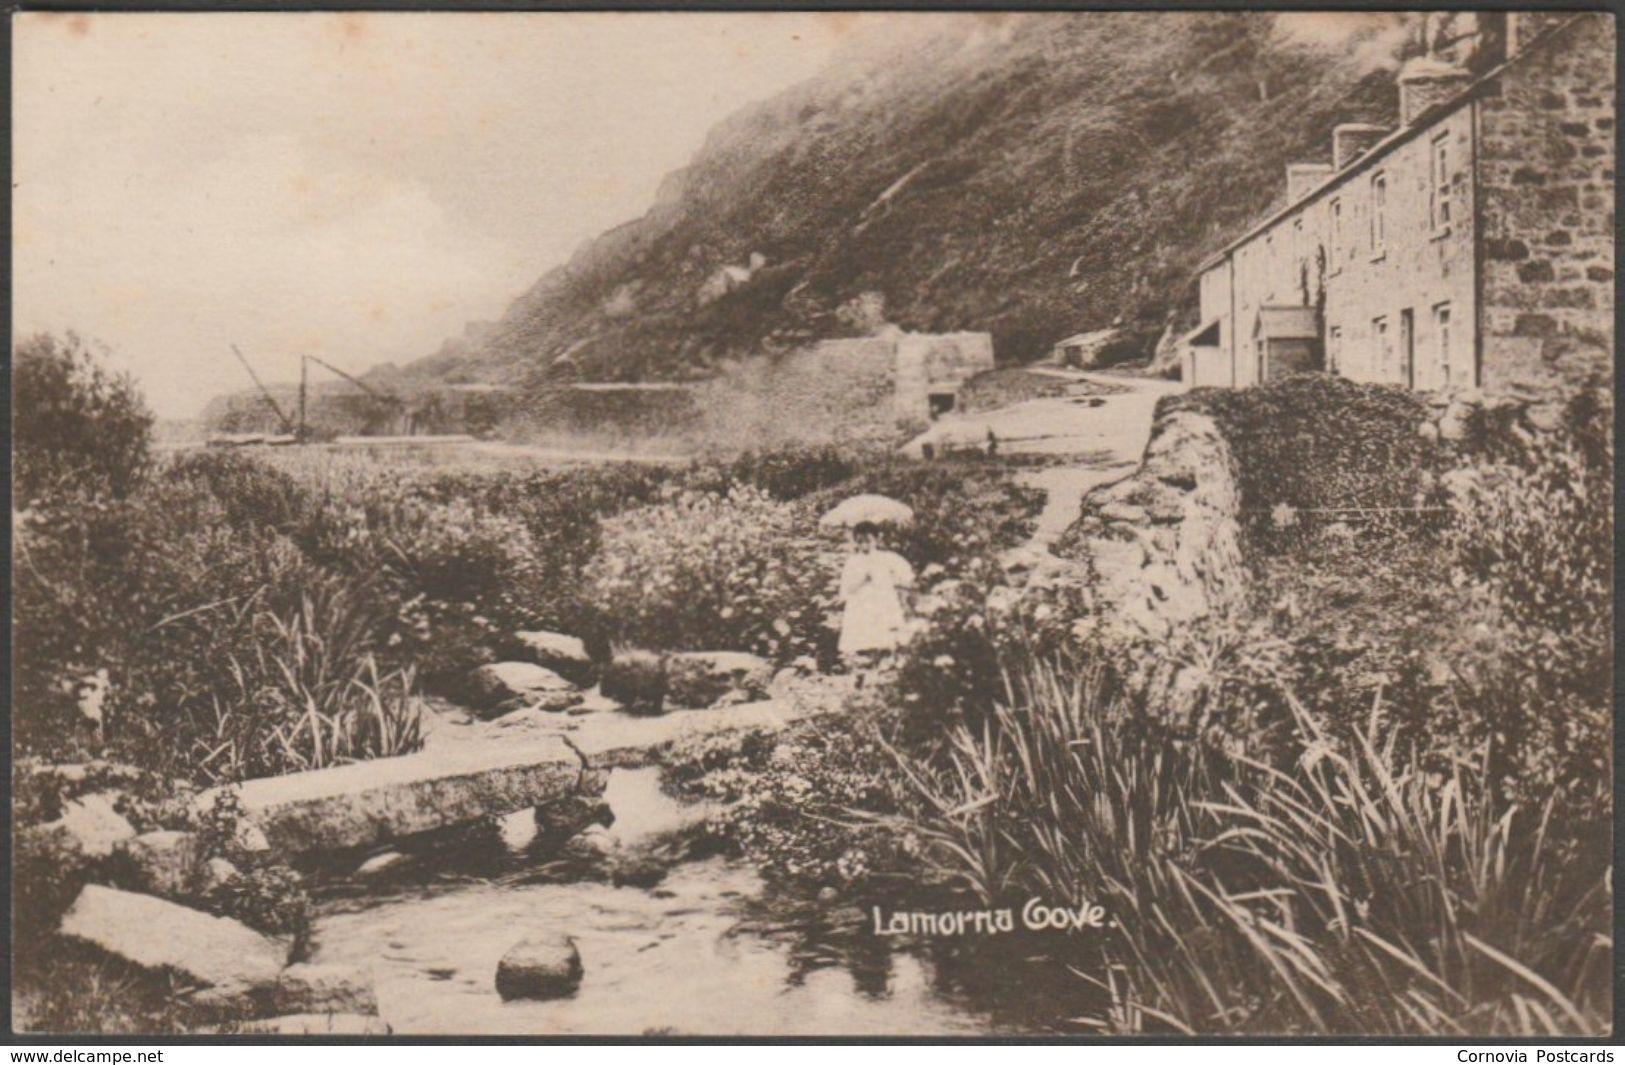 Lamorna Cove, Cornwall, c.1910s - Bowmaker Postcard